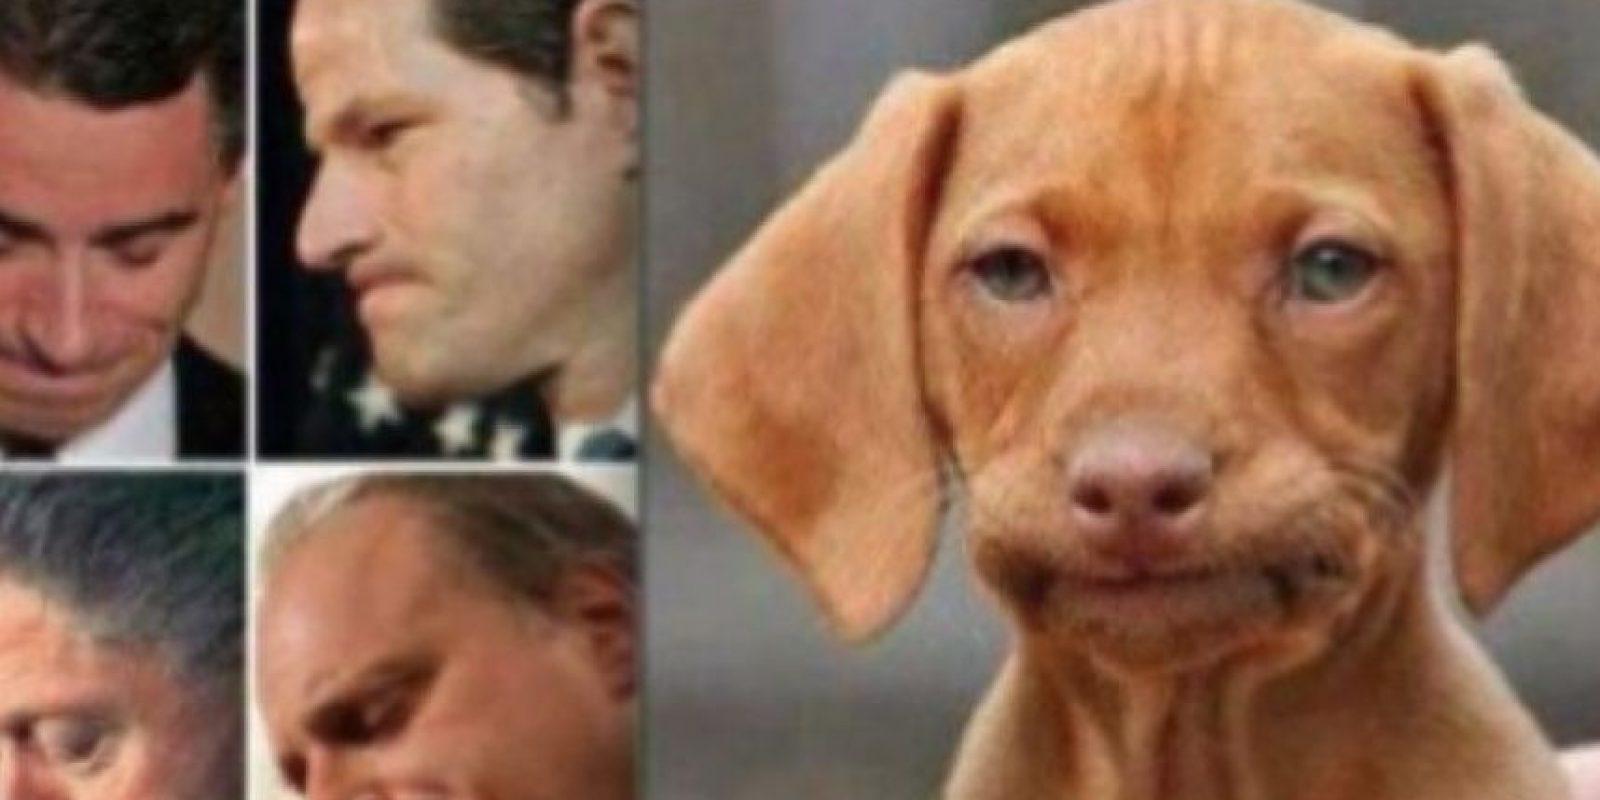 4. Con cara de desaprobación o resignación Foto:Know Your Meme